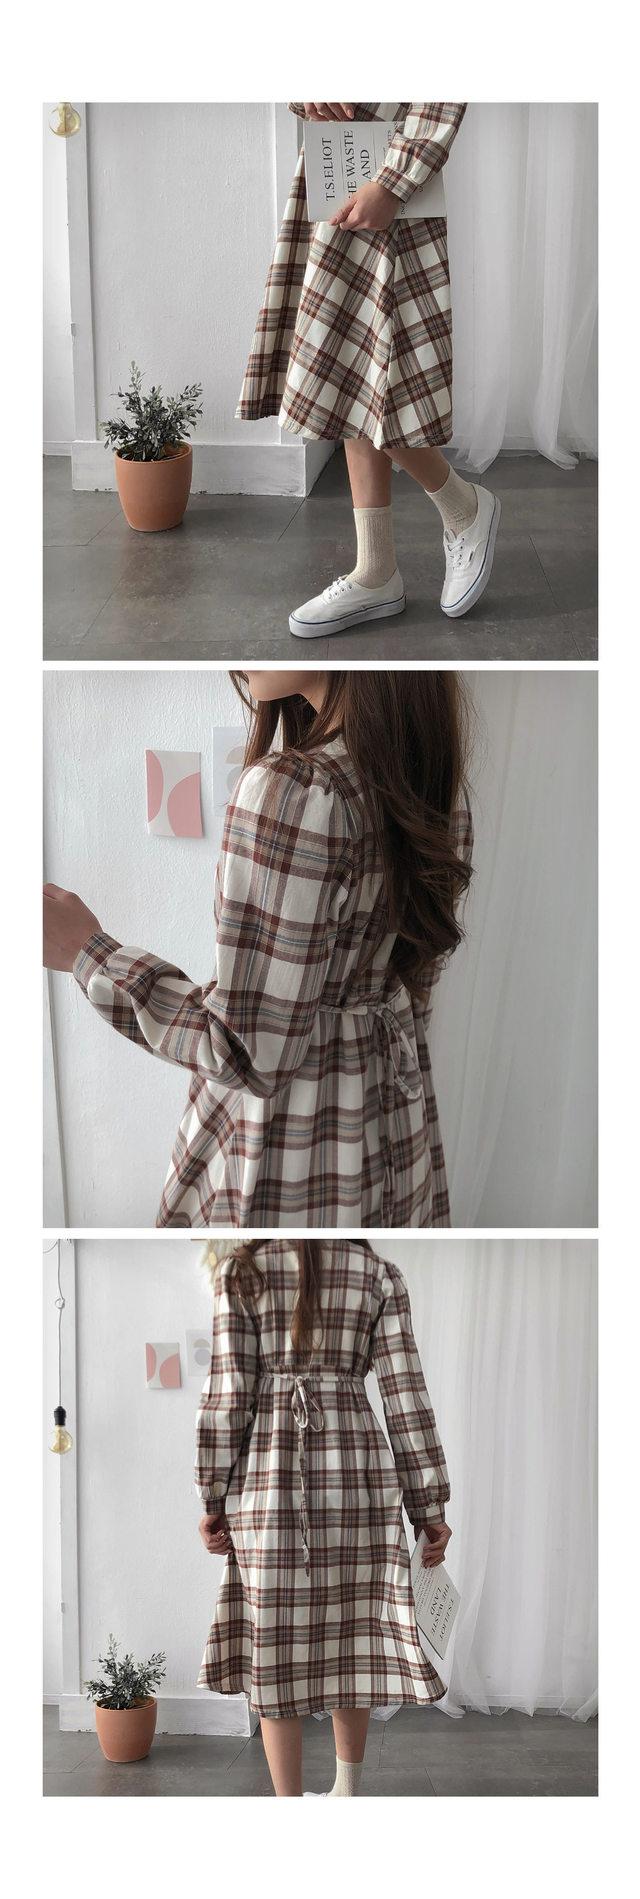 Lady check dress